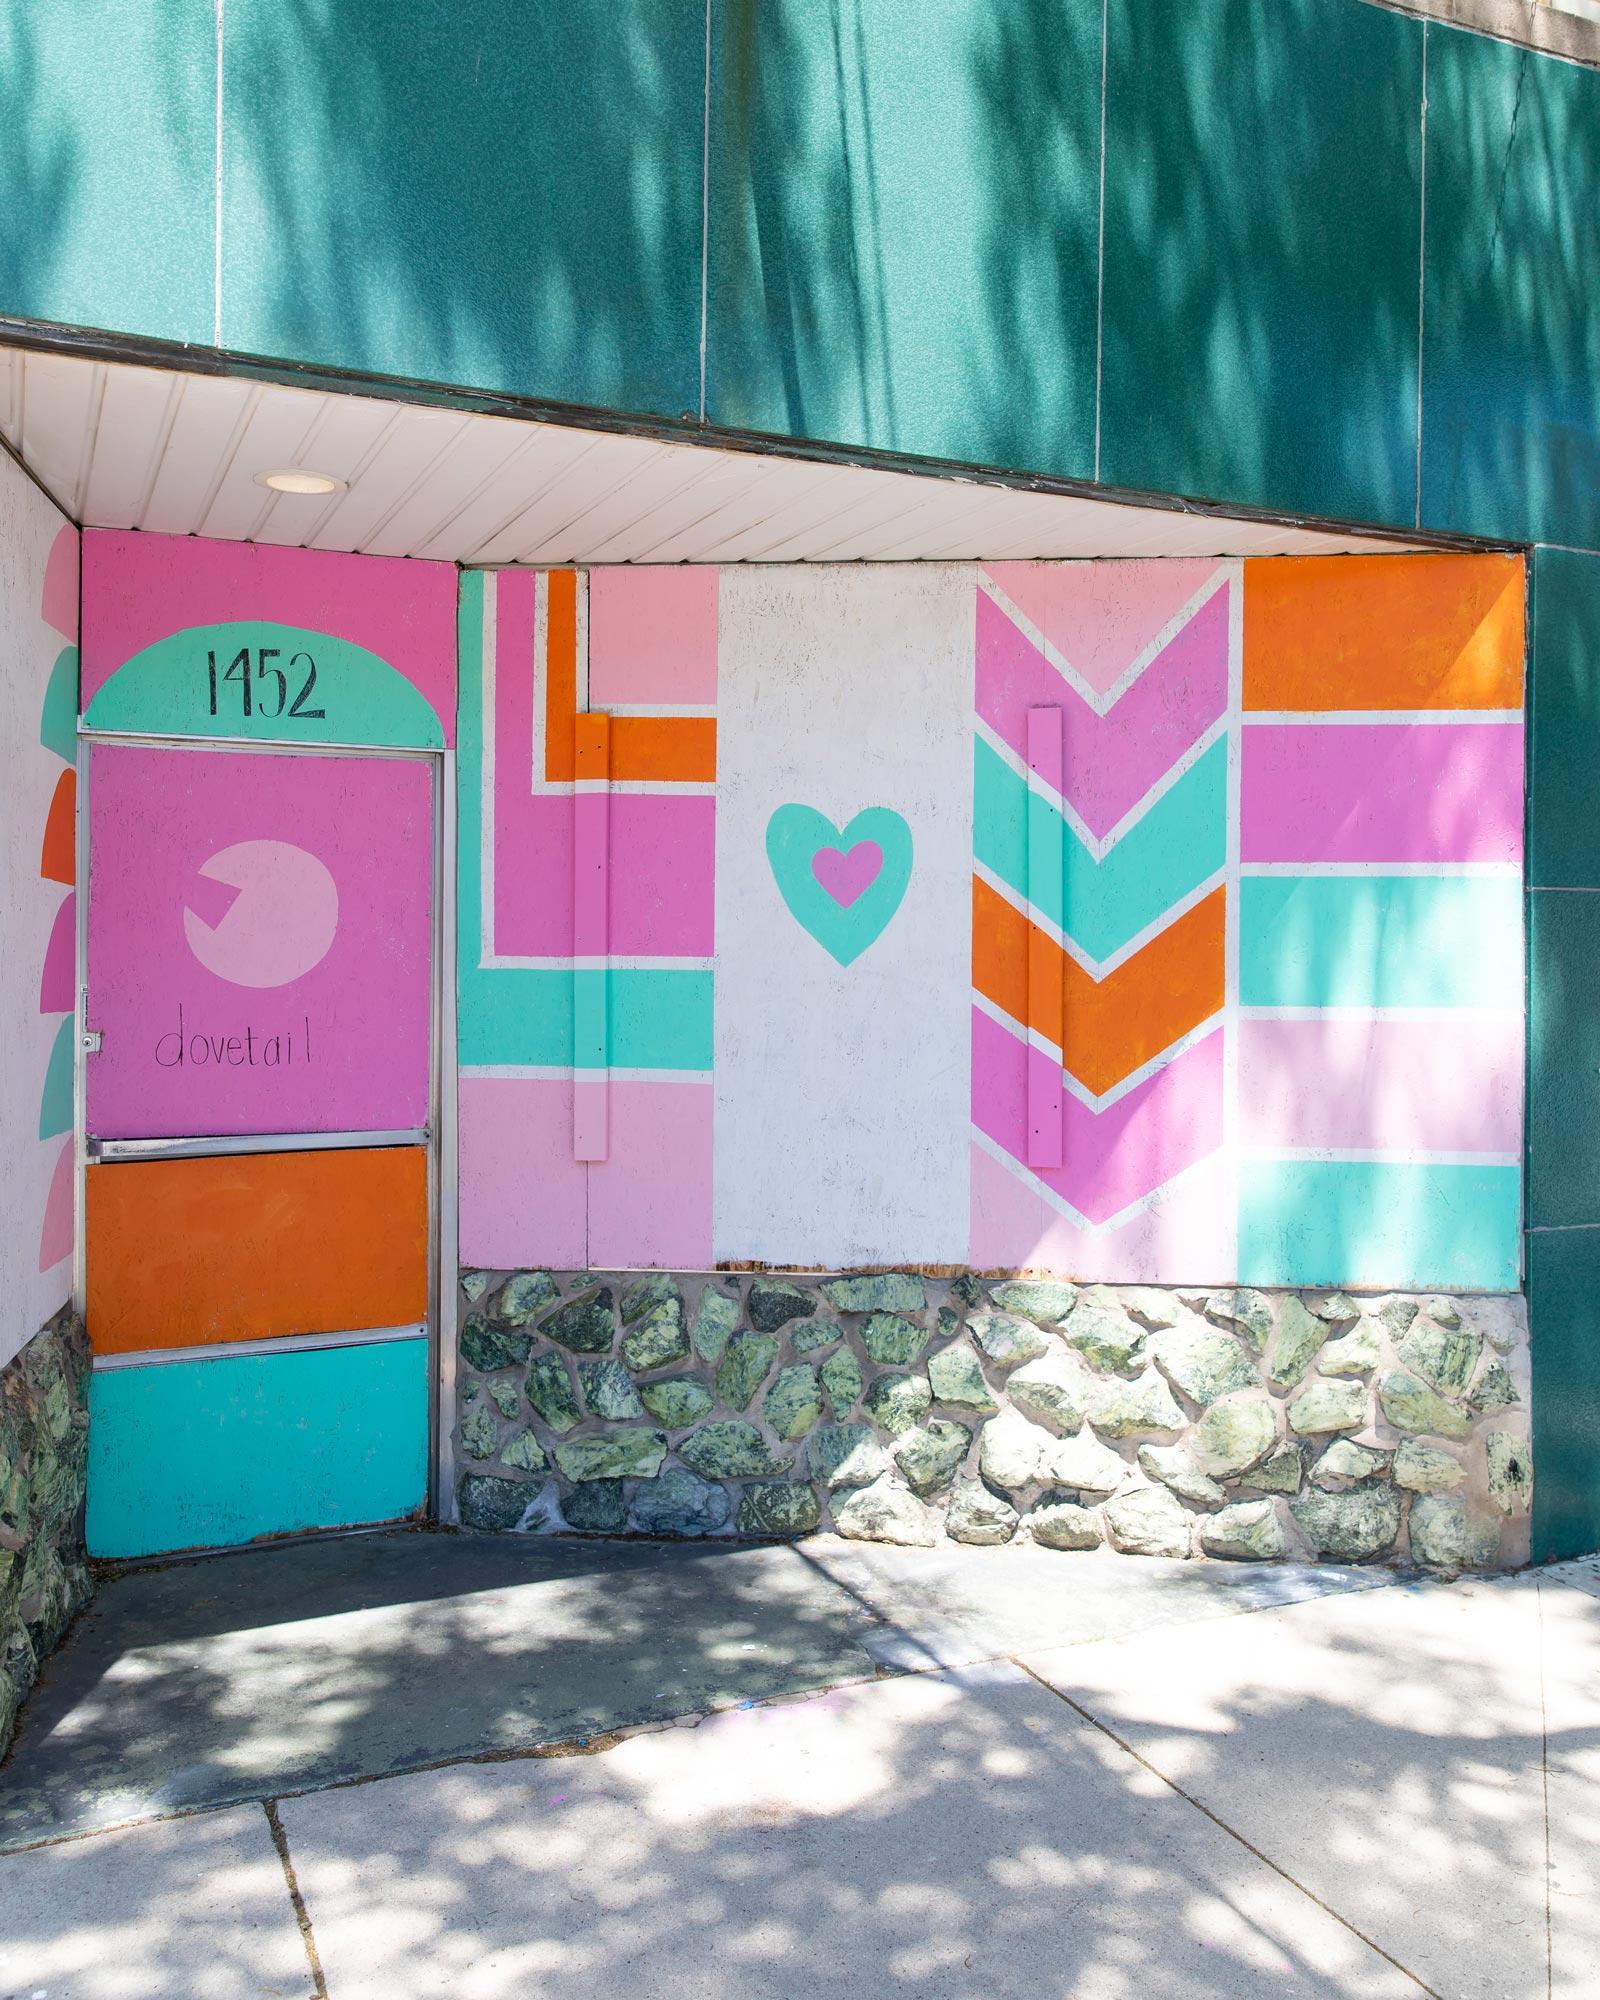 Dovetail Love Mural Chicago